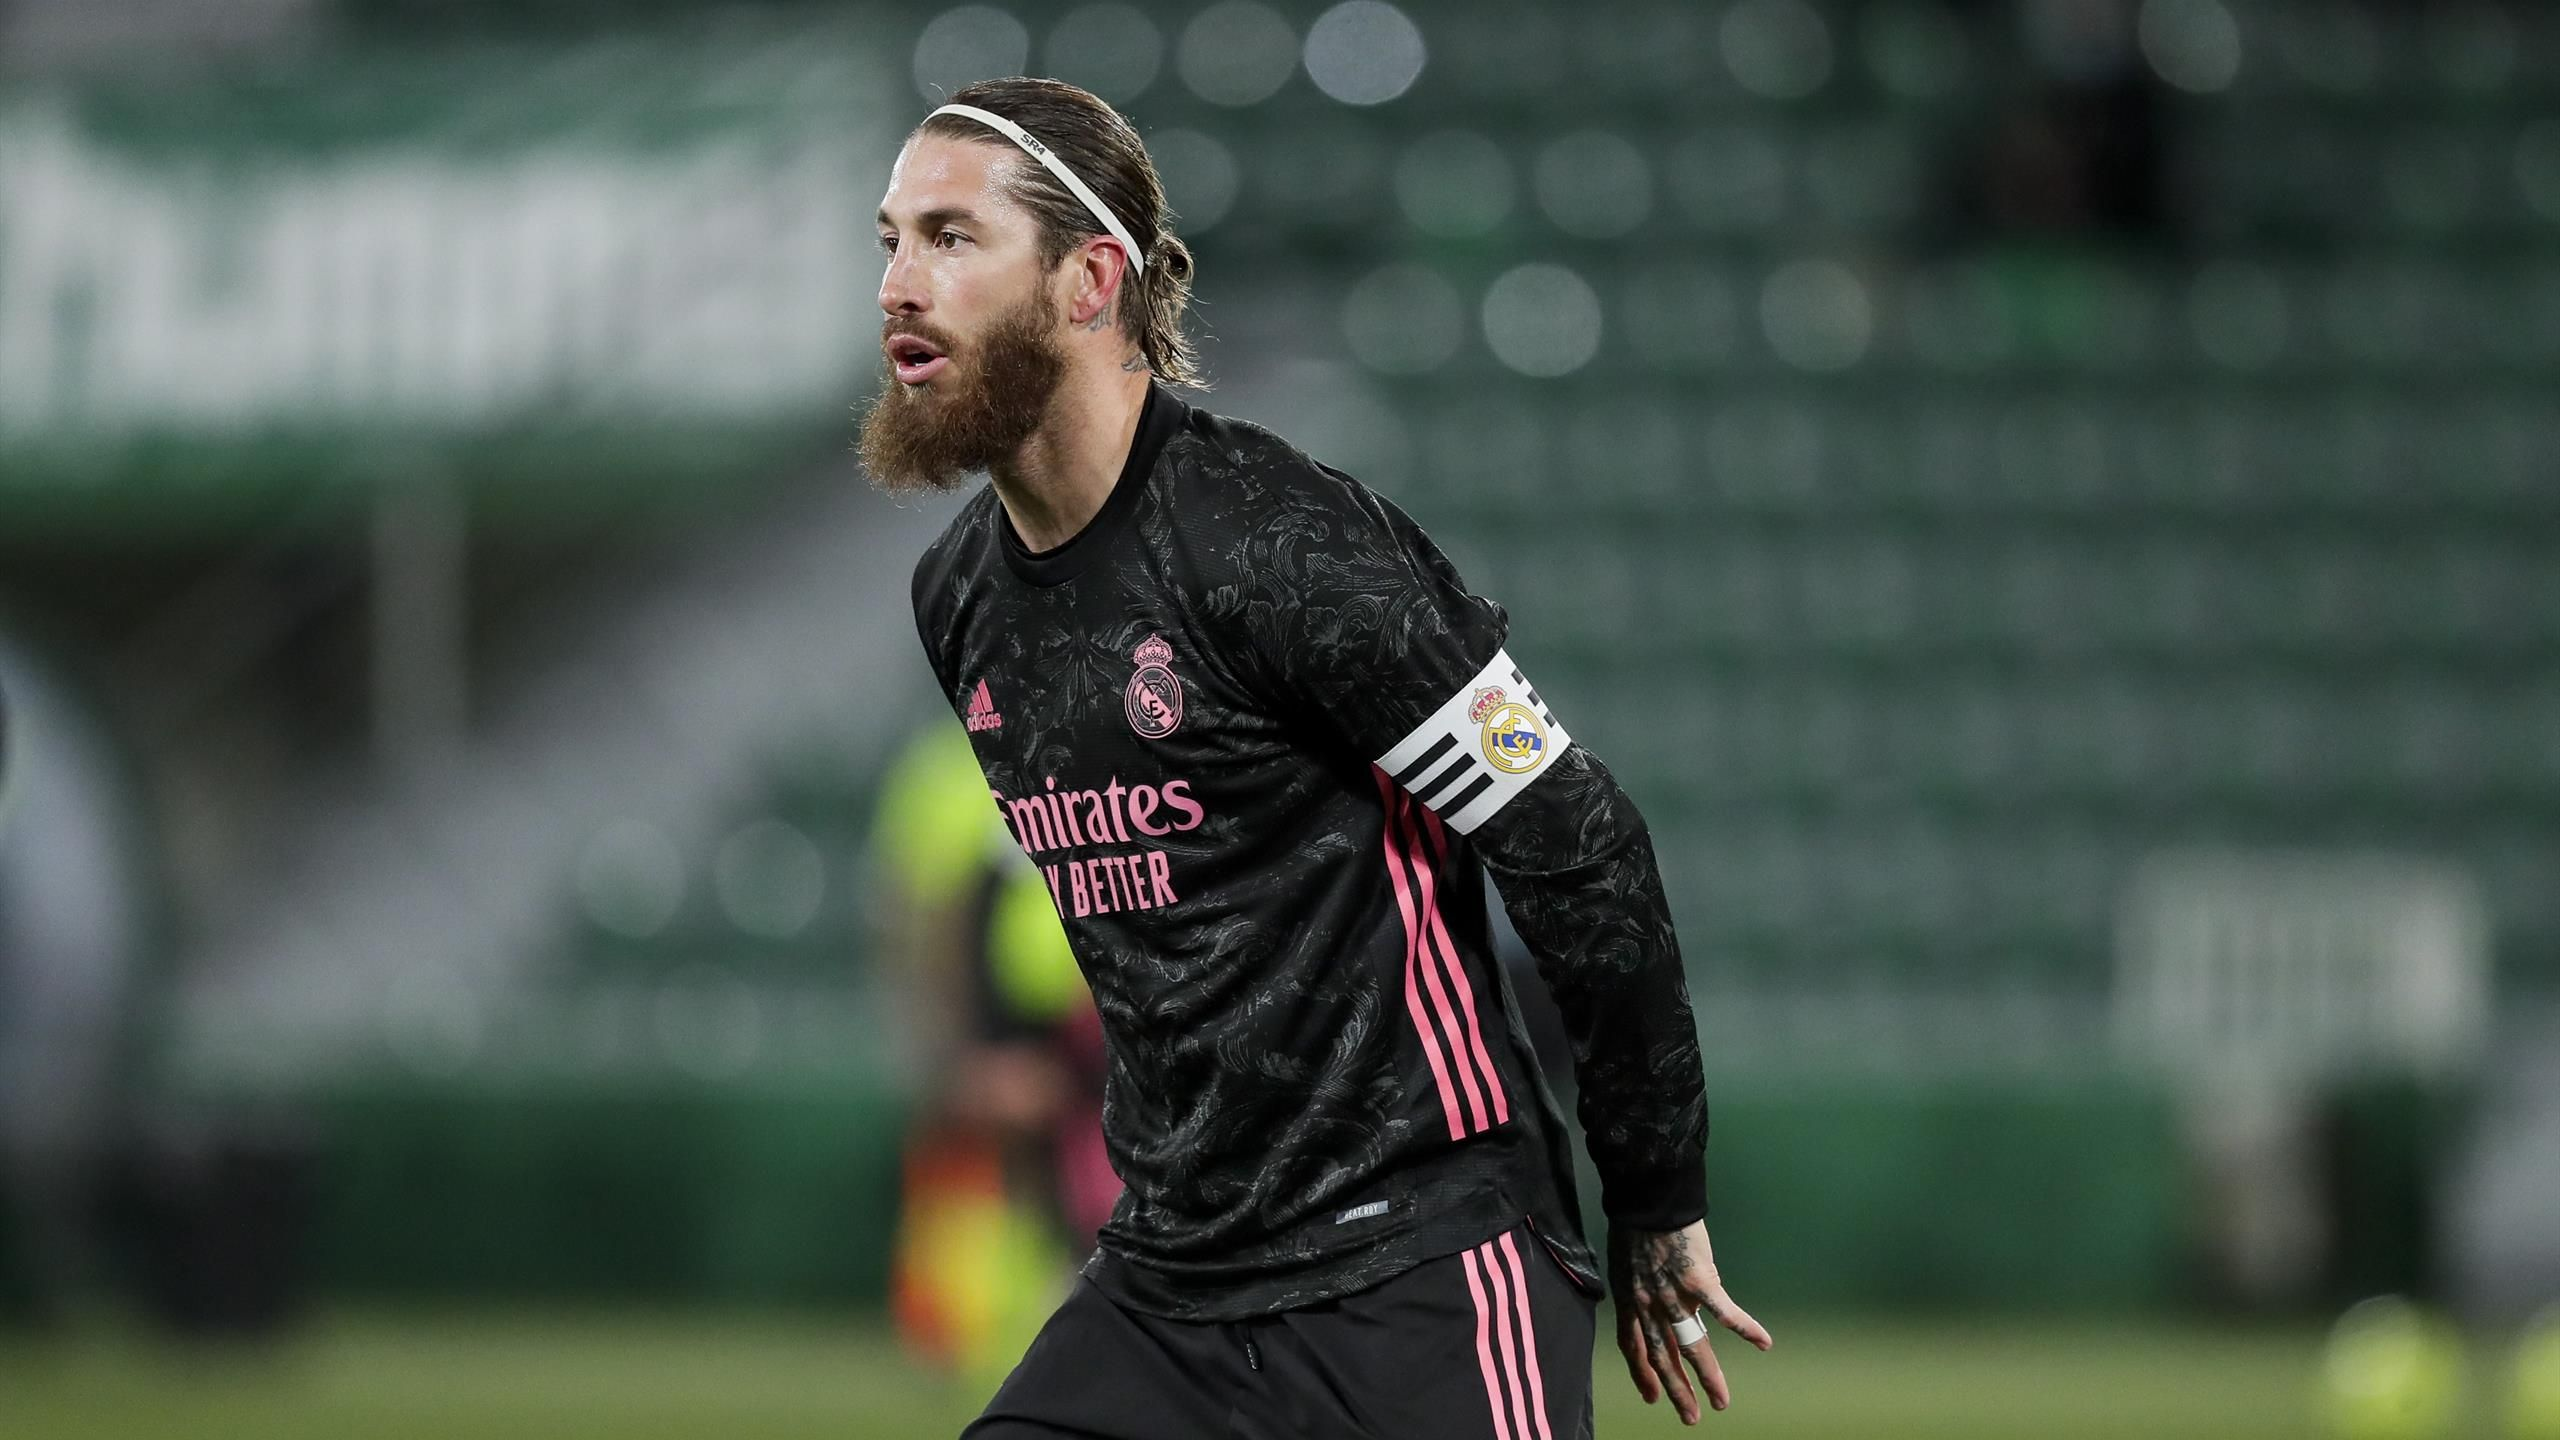 Ramos Haaland Lyon Les 12 Infos Mercato Qui Vous Ont Echappe Lundi Eurosport